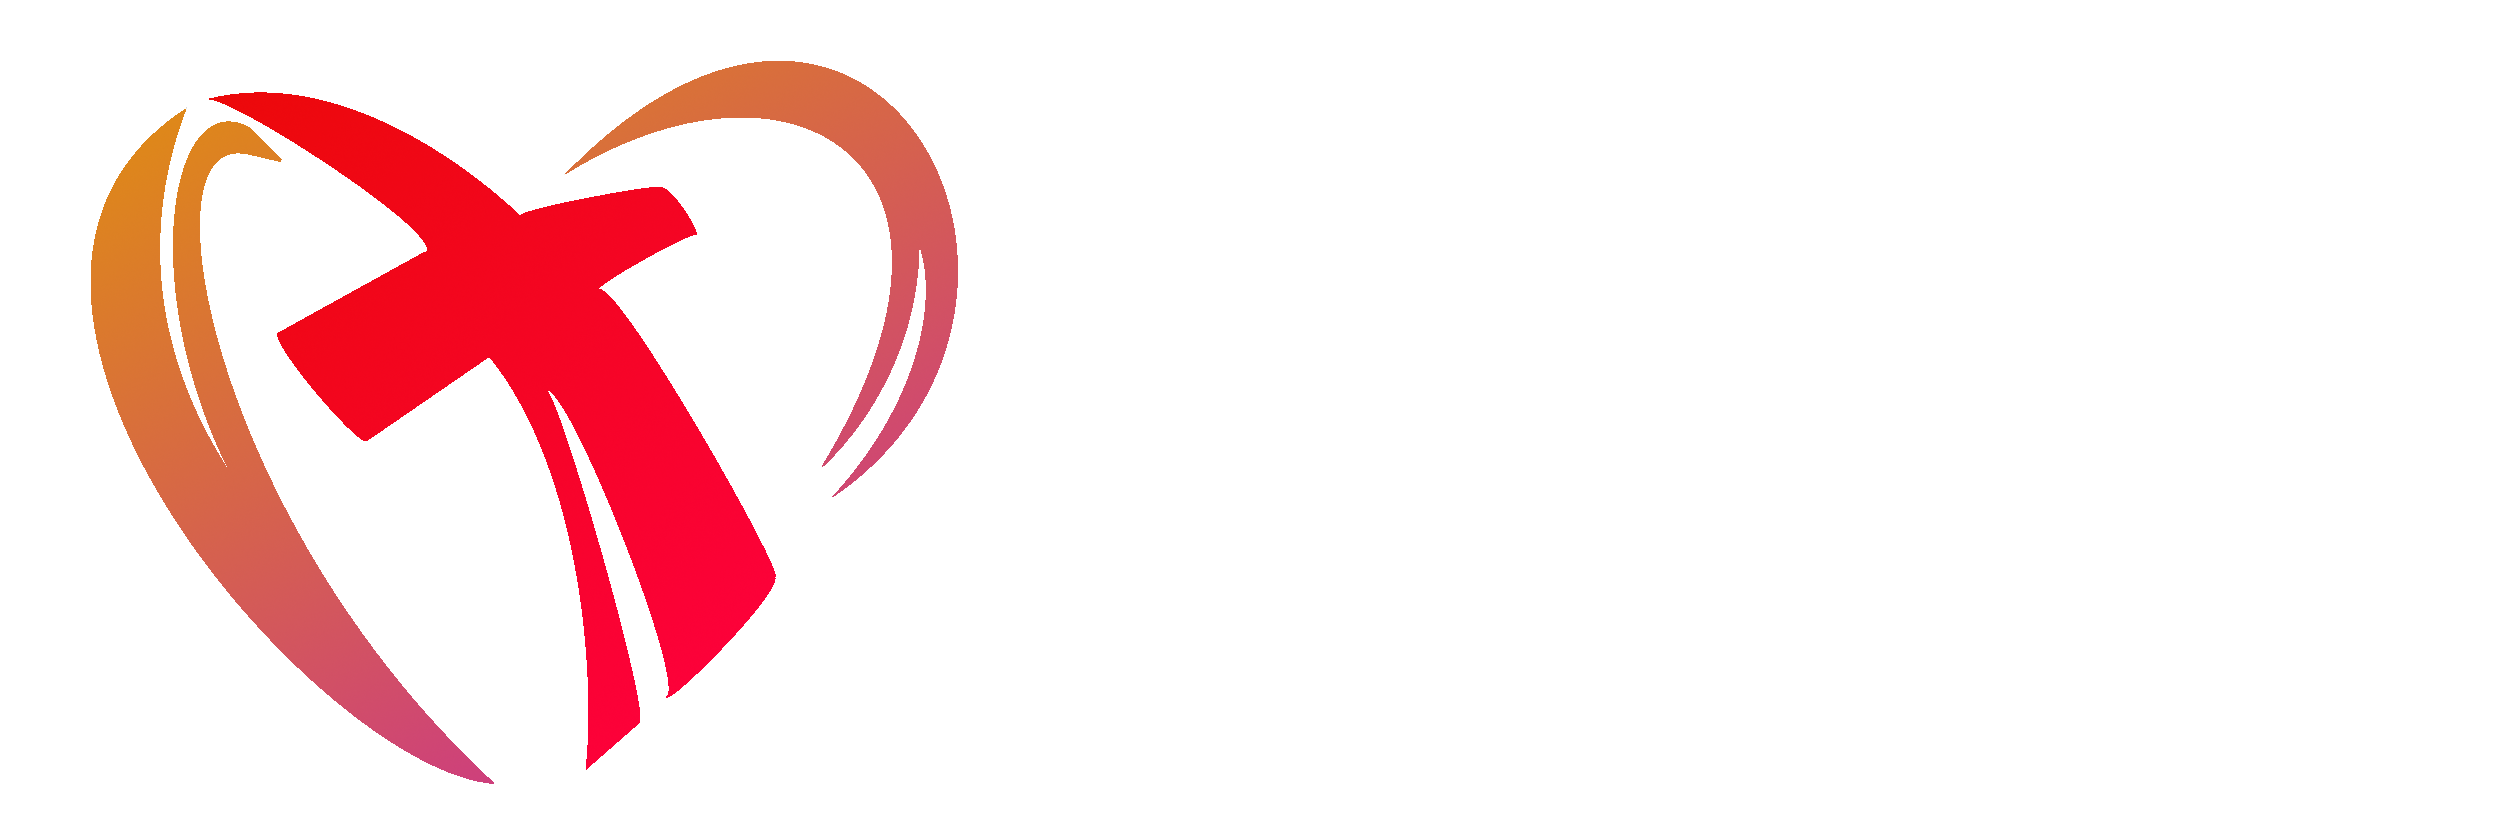 Wea Ridge Baptist Church